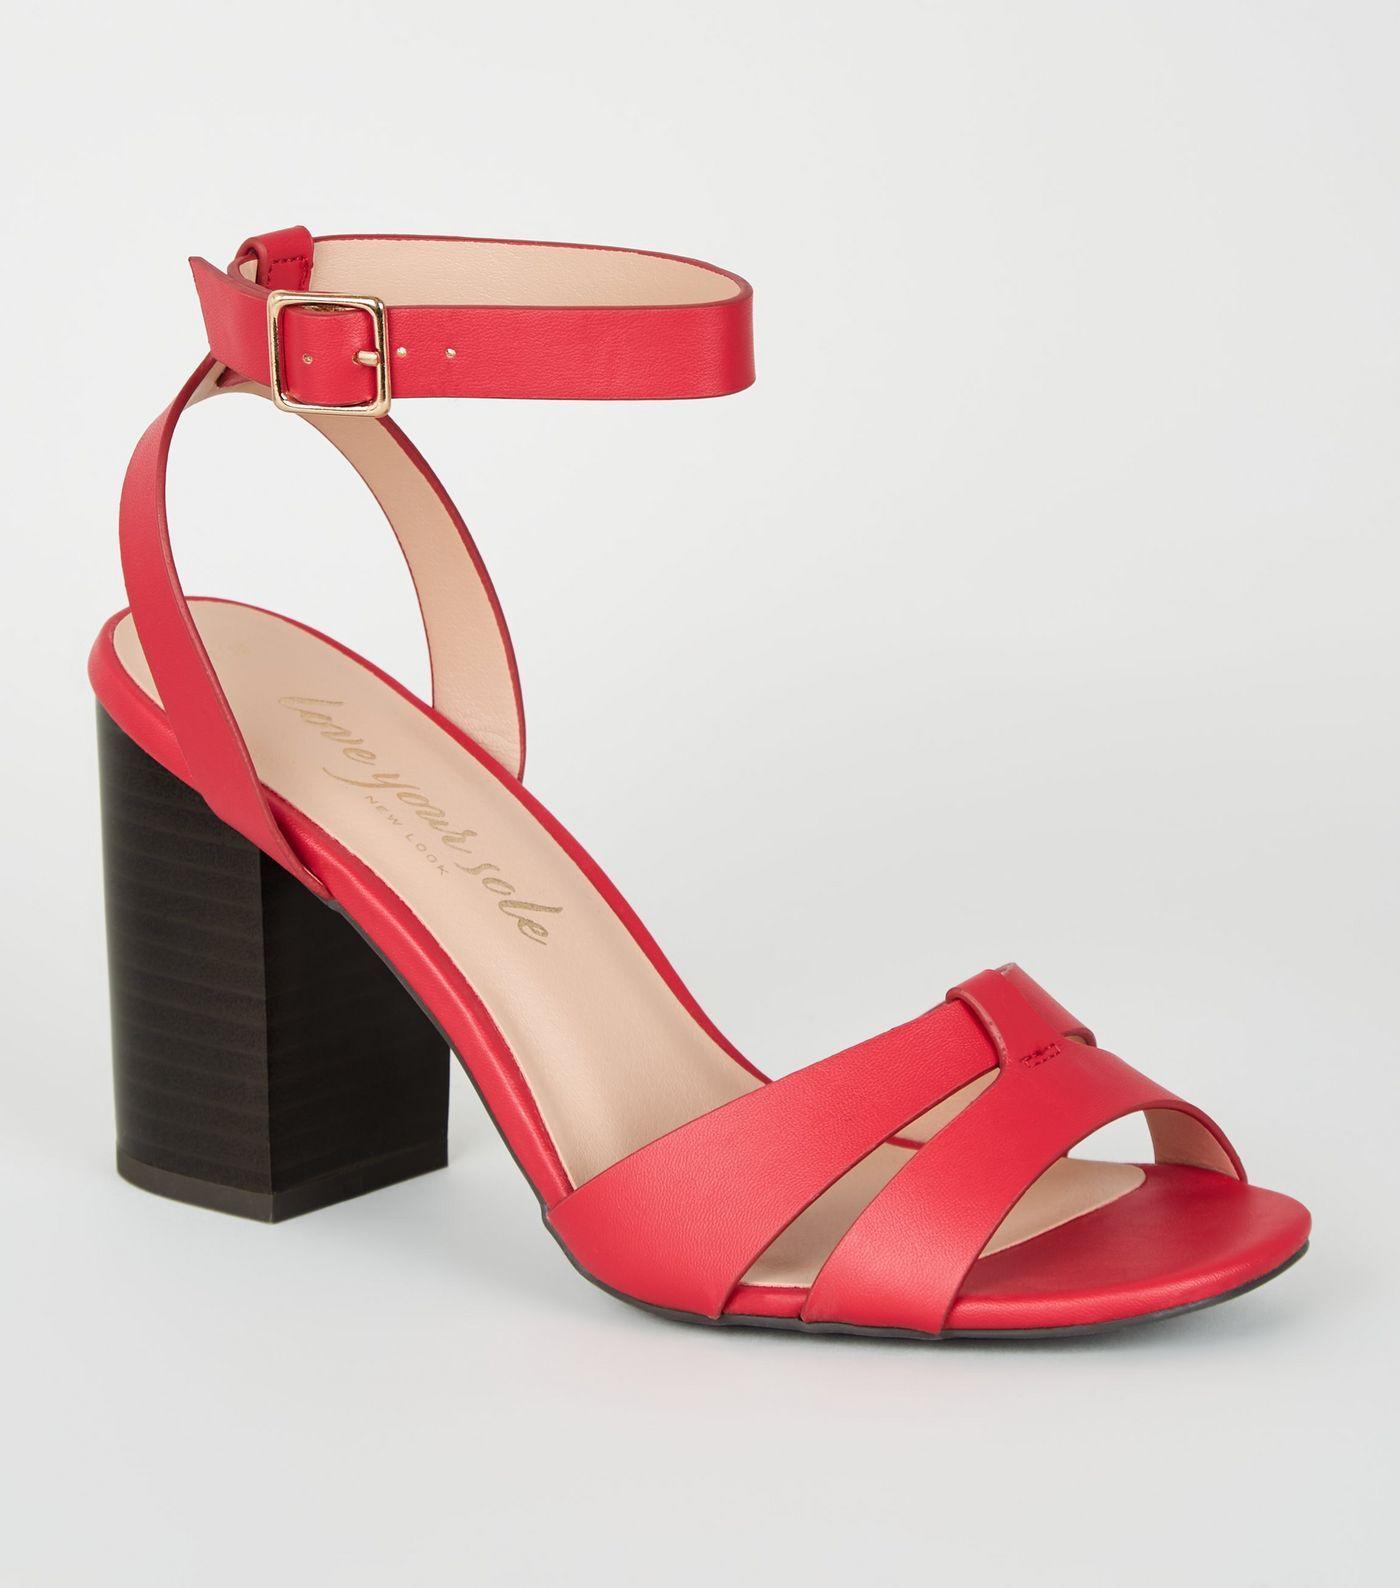 Red Leather Look 2 Part Block Heels | Footware in 2019 | Red